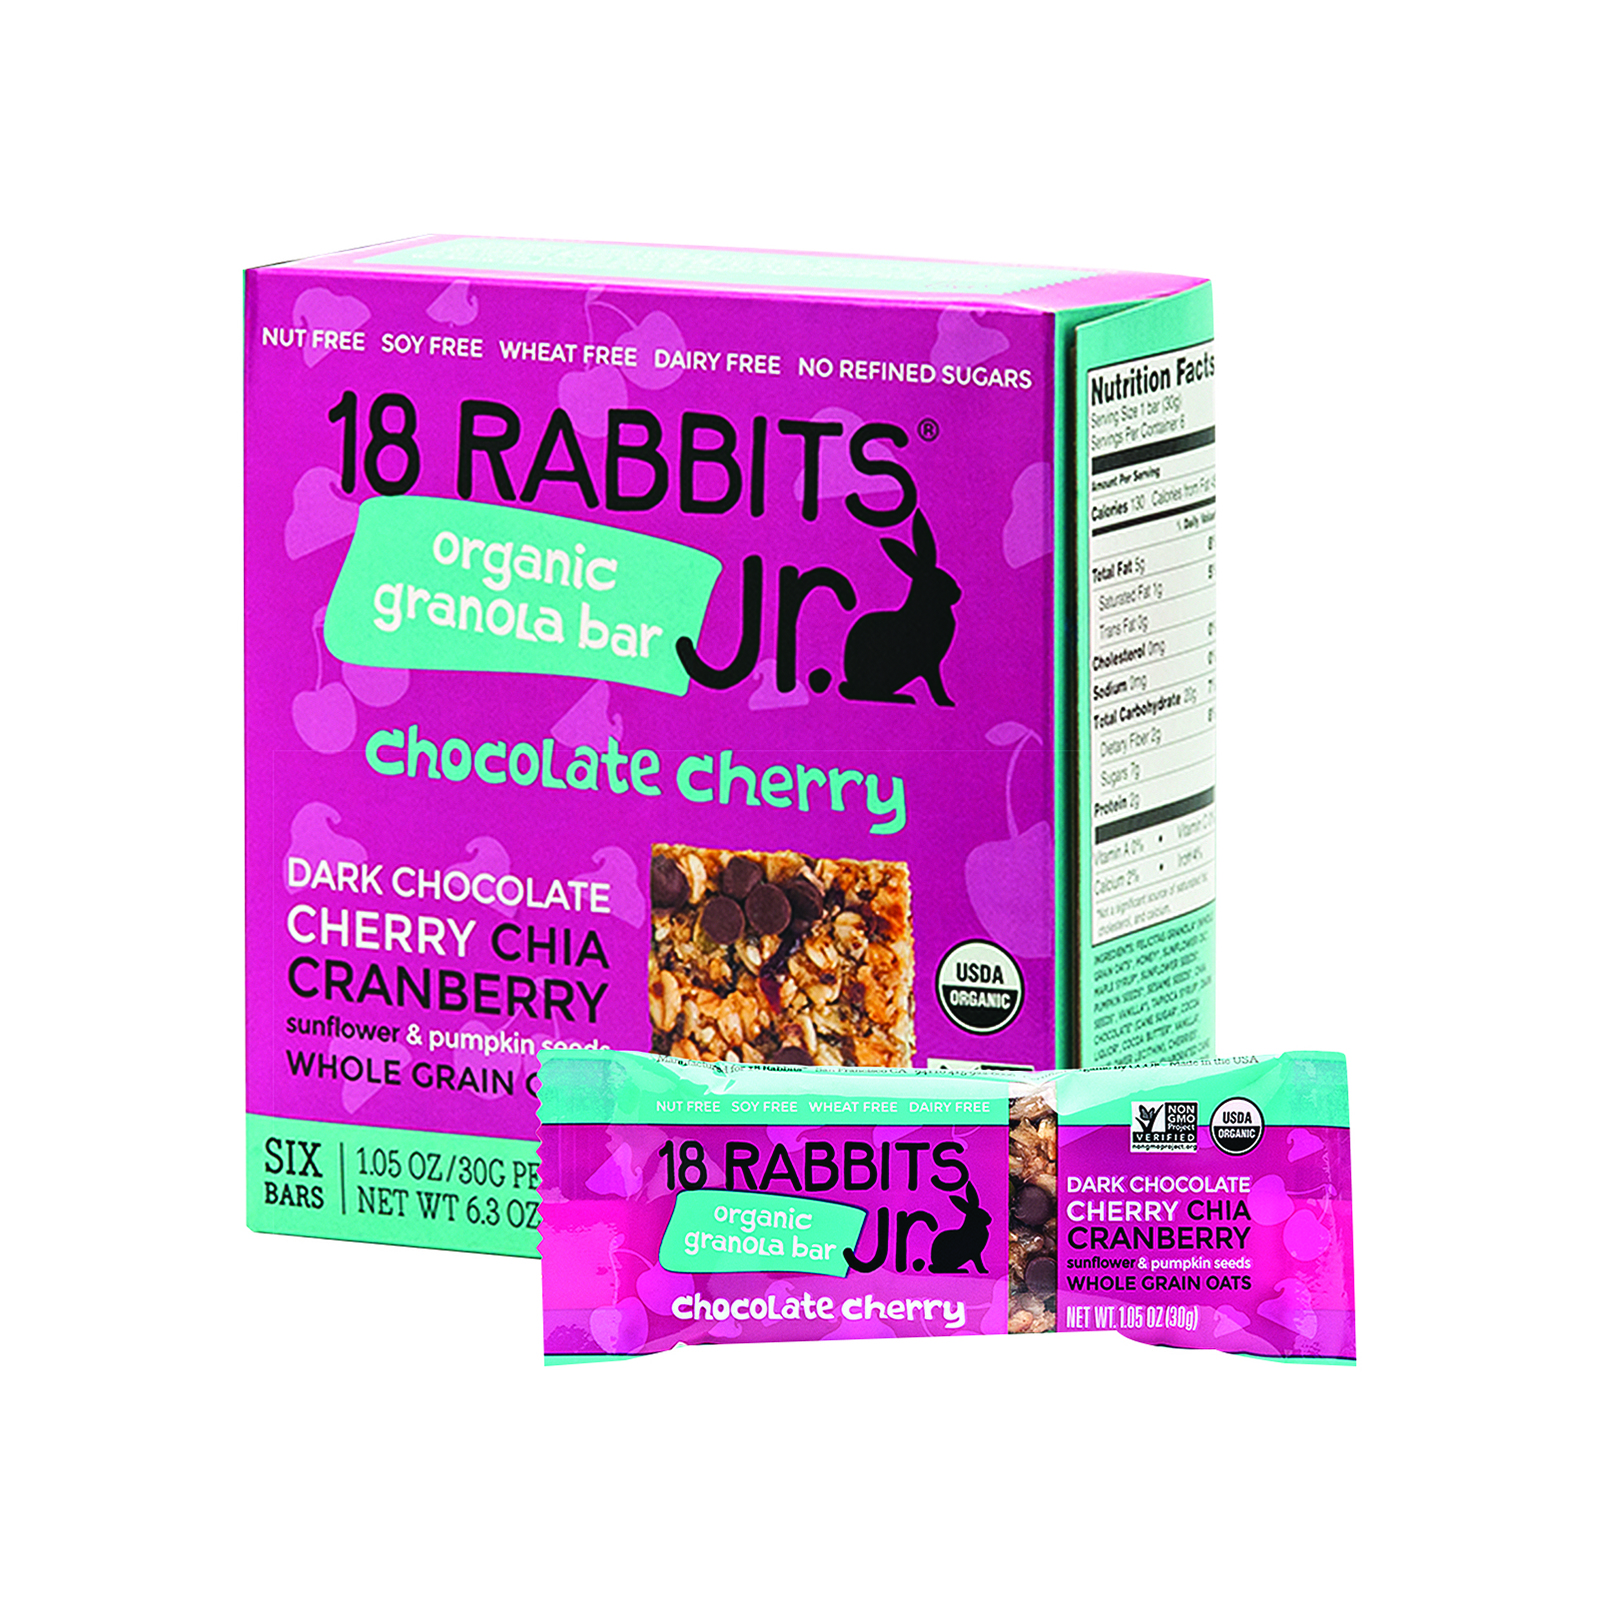 18 Rabbits Jr. Granola Bar - Chocolate Cherry - Case of 6 - 1.05 oz.